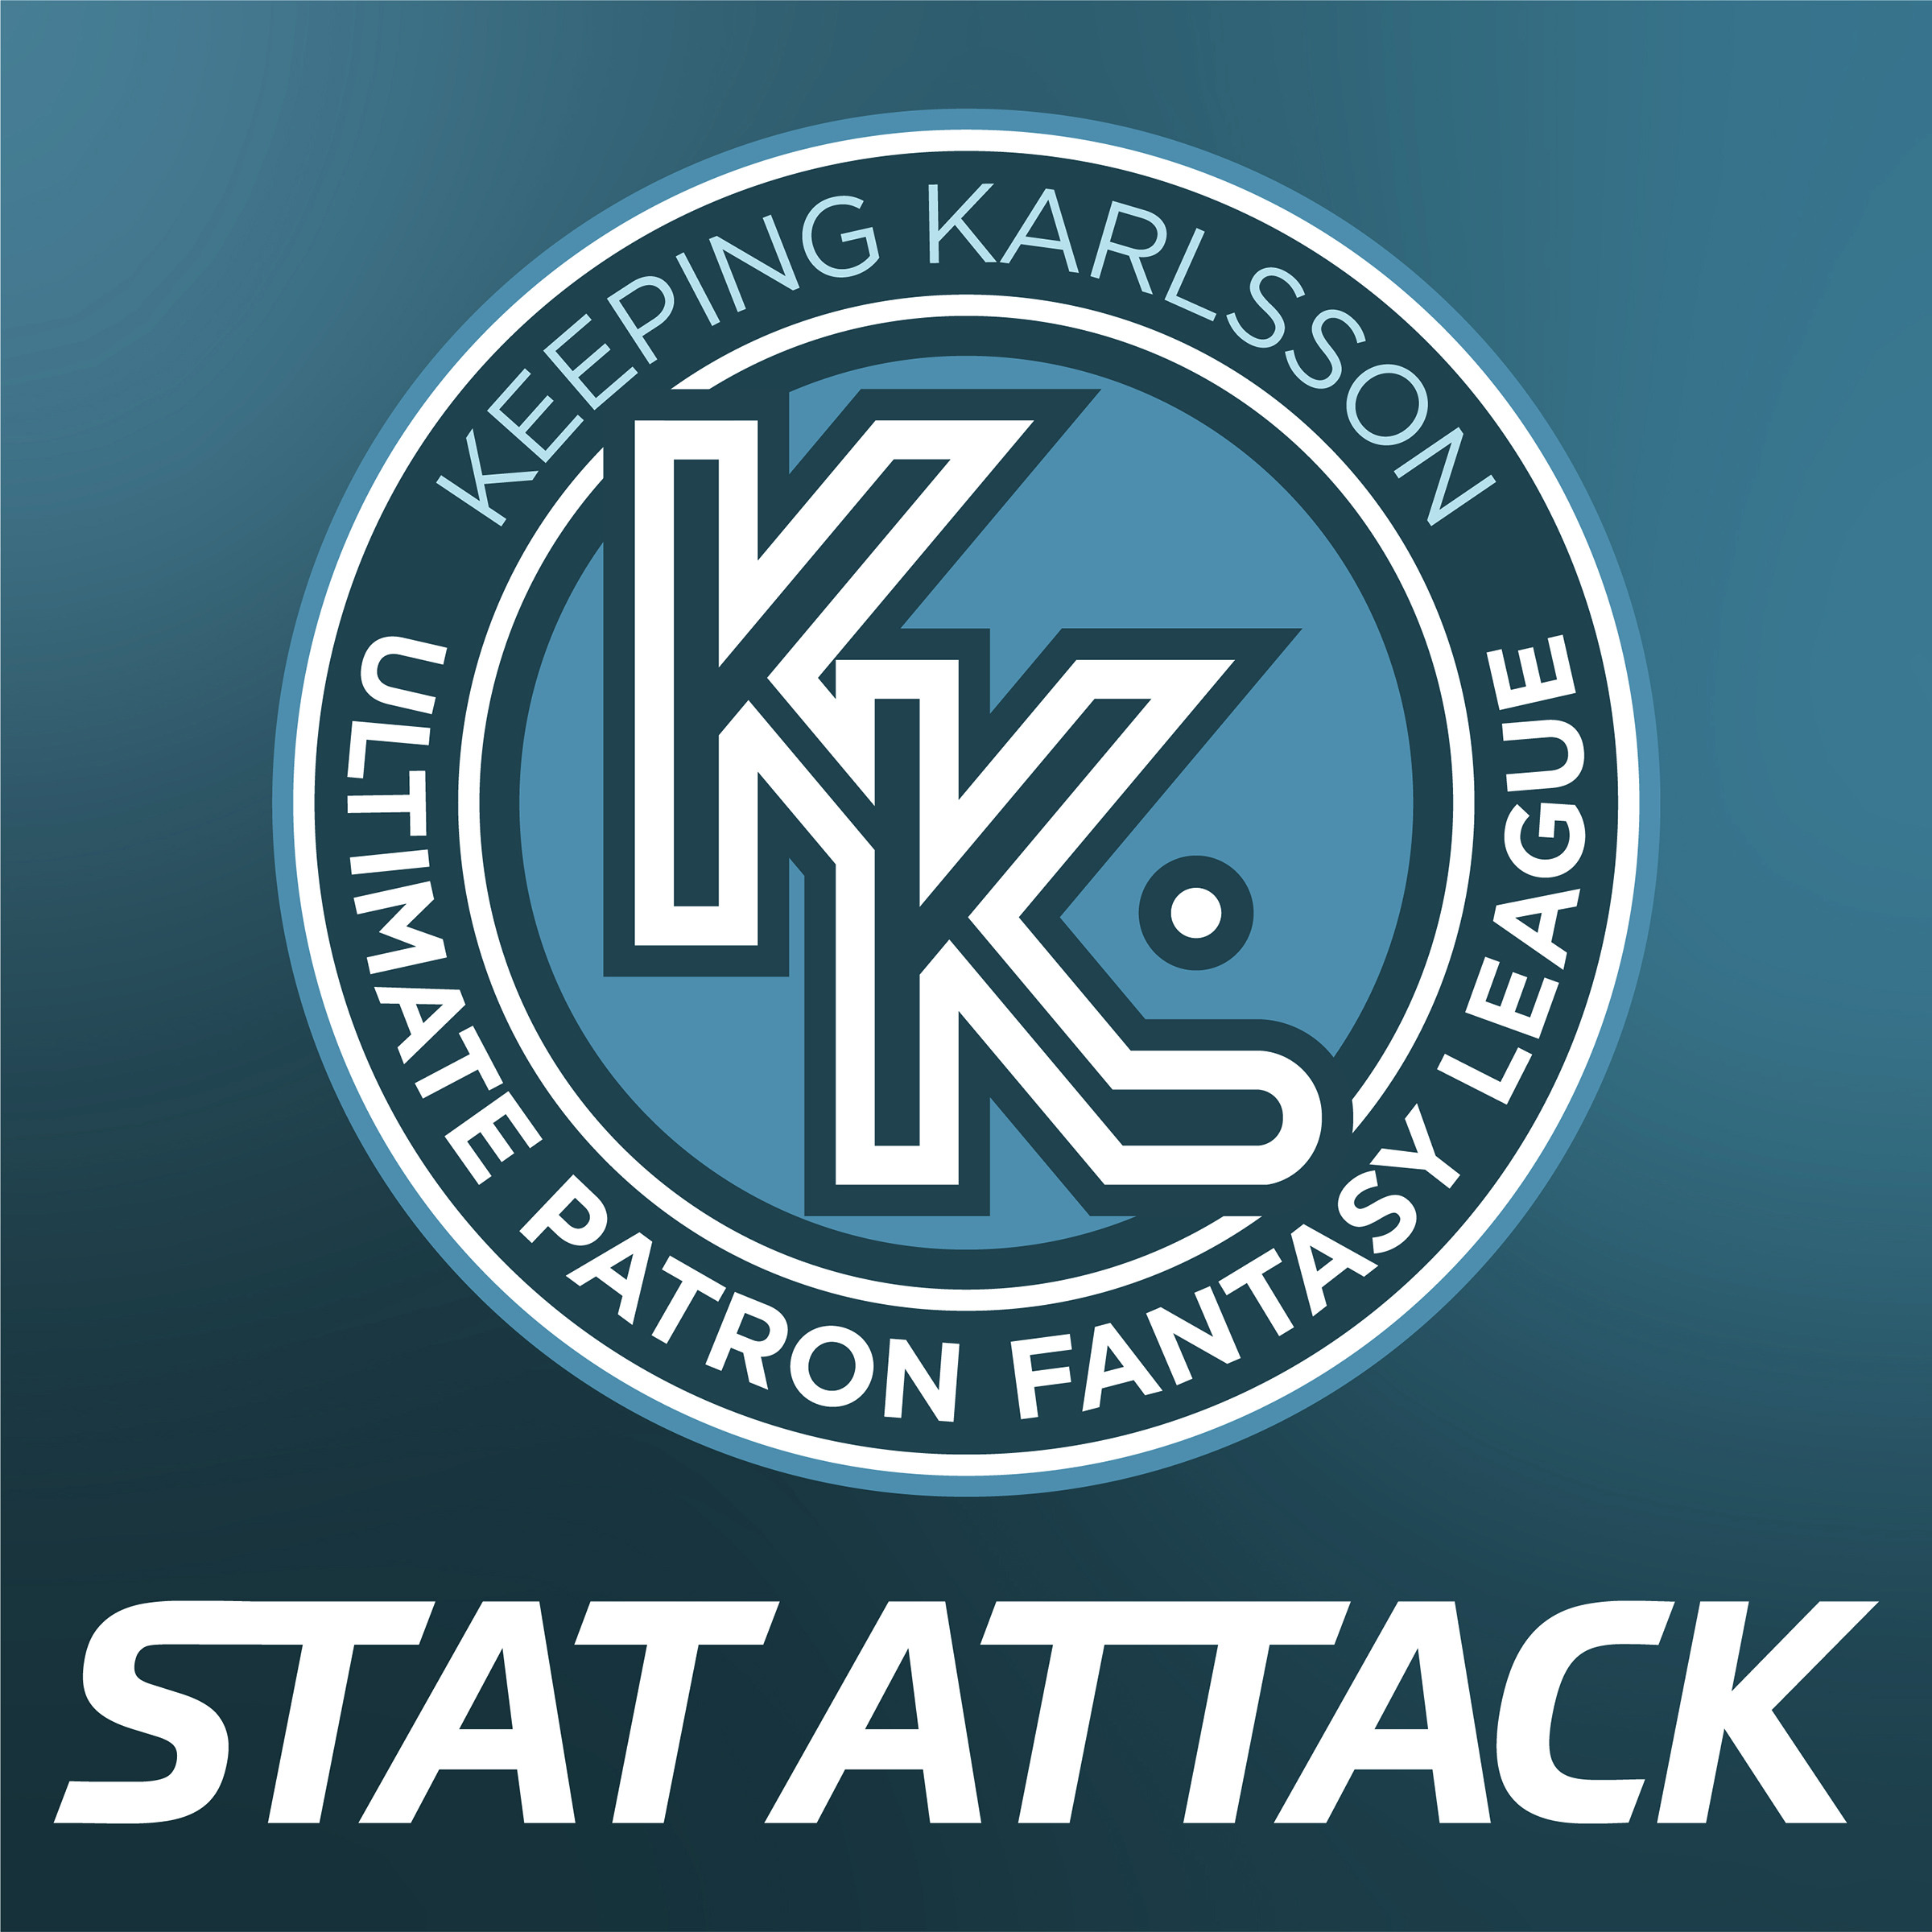 Stat Attack S02E05 - Kahlil and Alyson